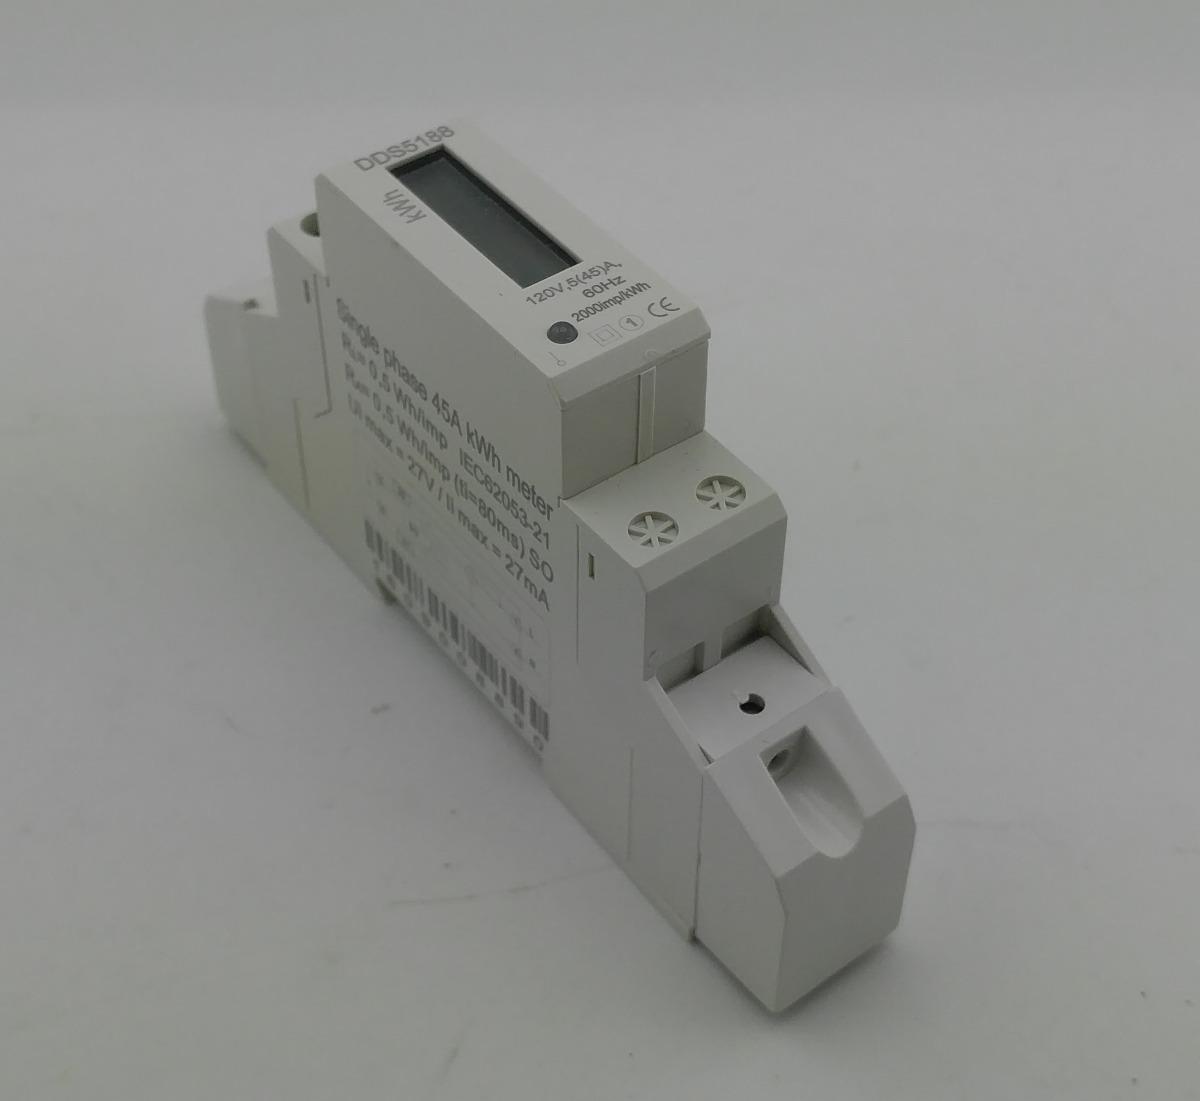 d1e1339334f medidor consumo de energia compacto 110v 127v 45a monofásico. Carregando  zoom.